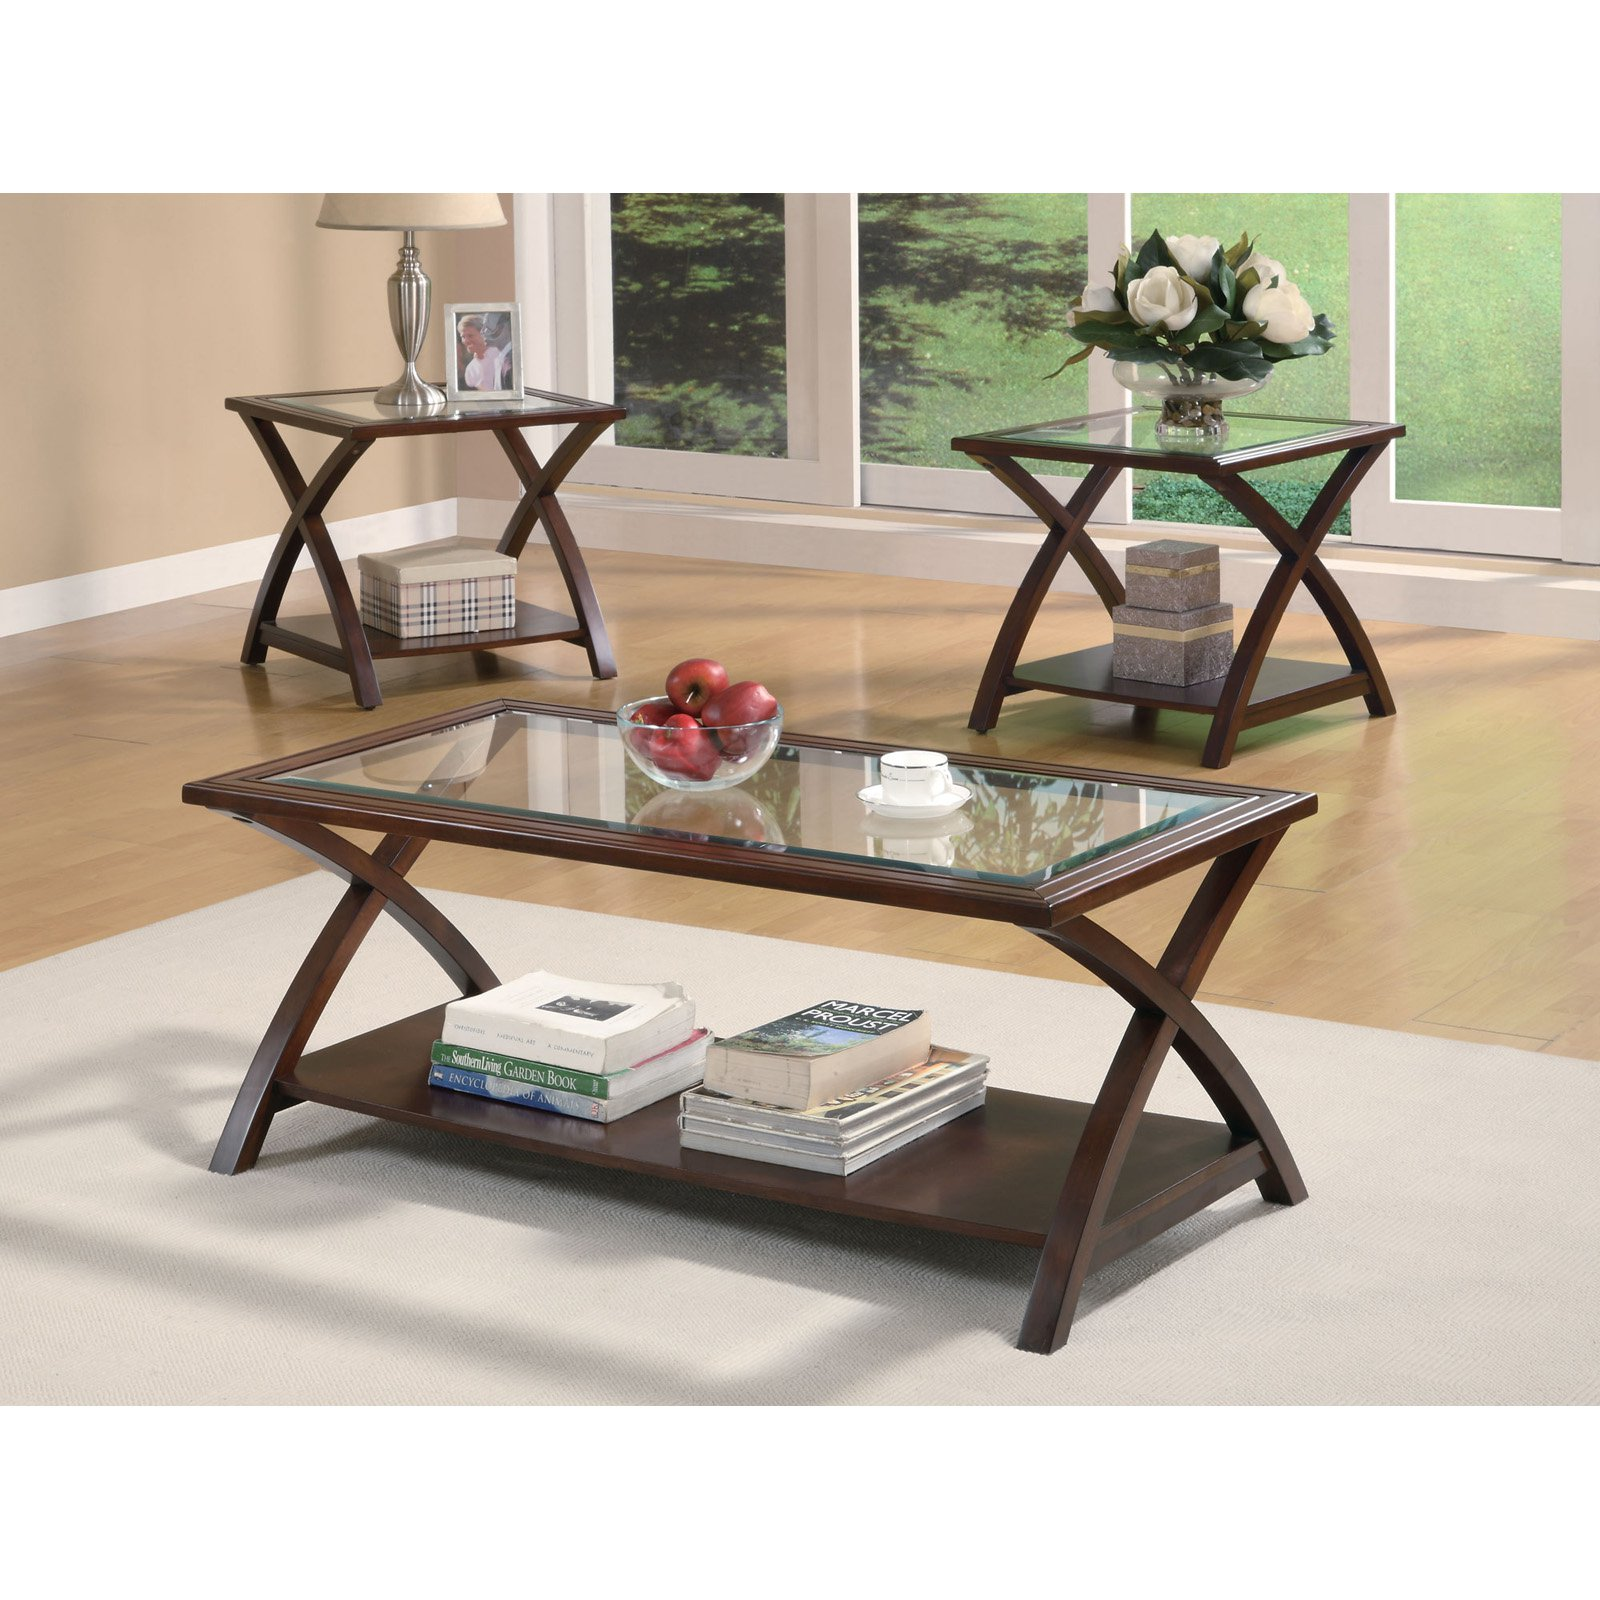 Coaster 3-Piece Table Set, Warm Light Bourbon Finish